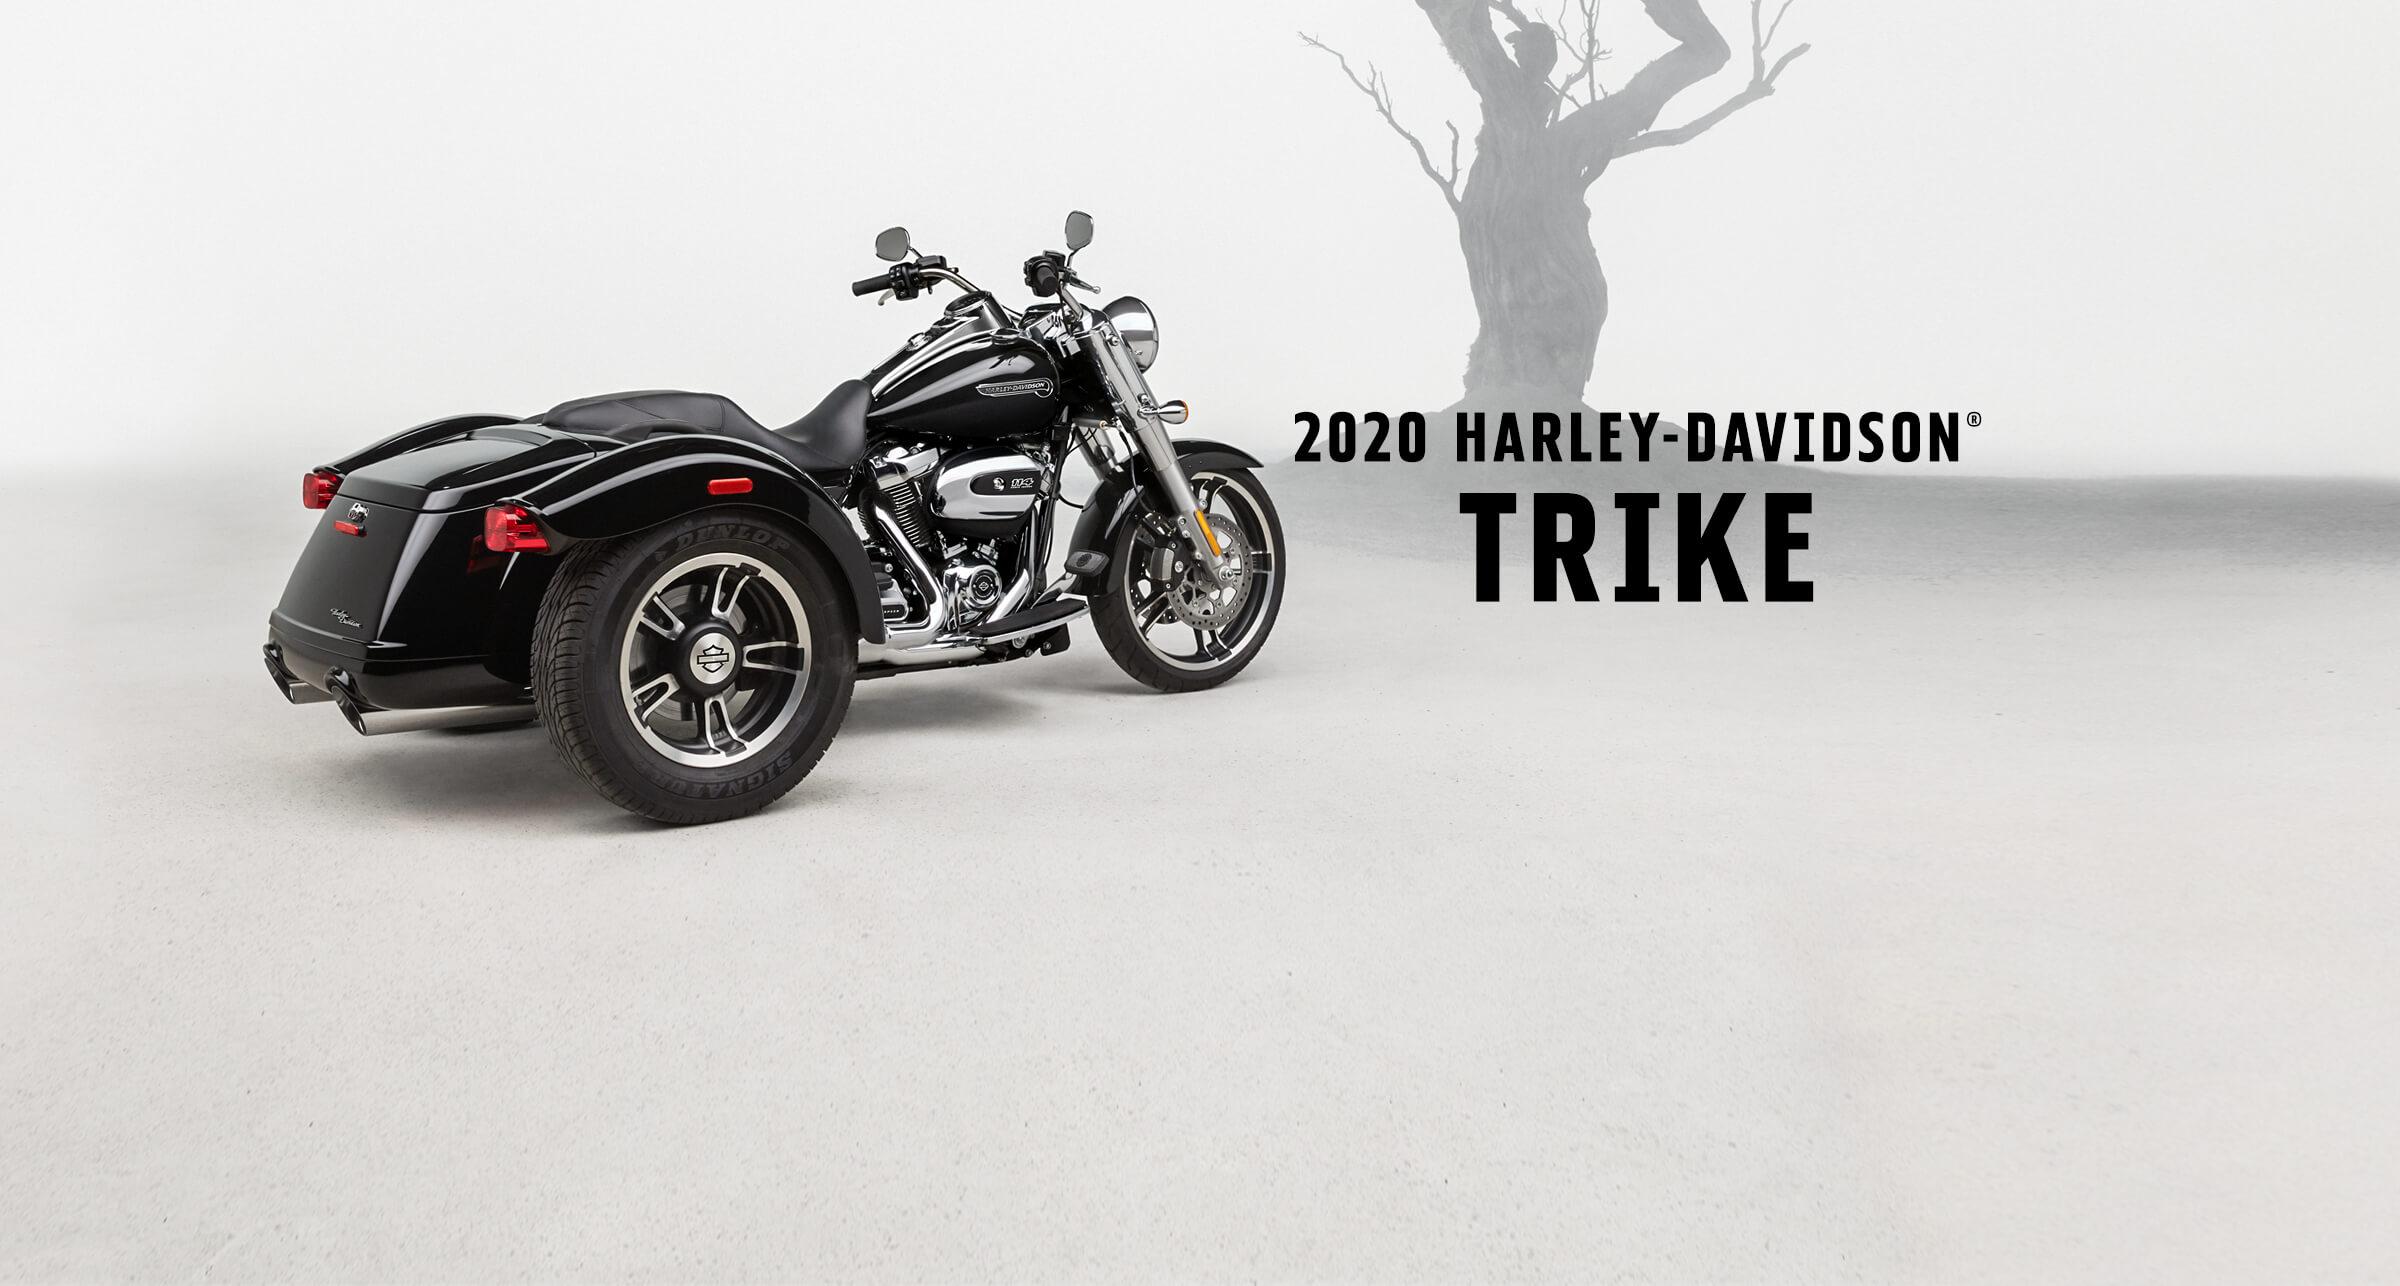 Trike - 2020 motorsykler